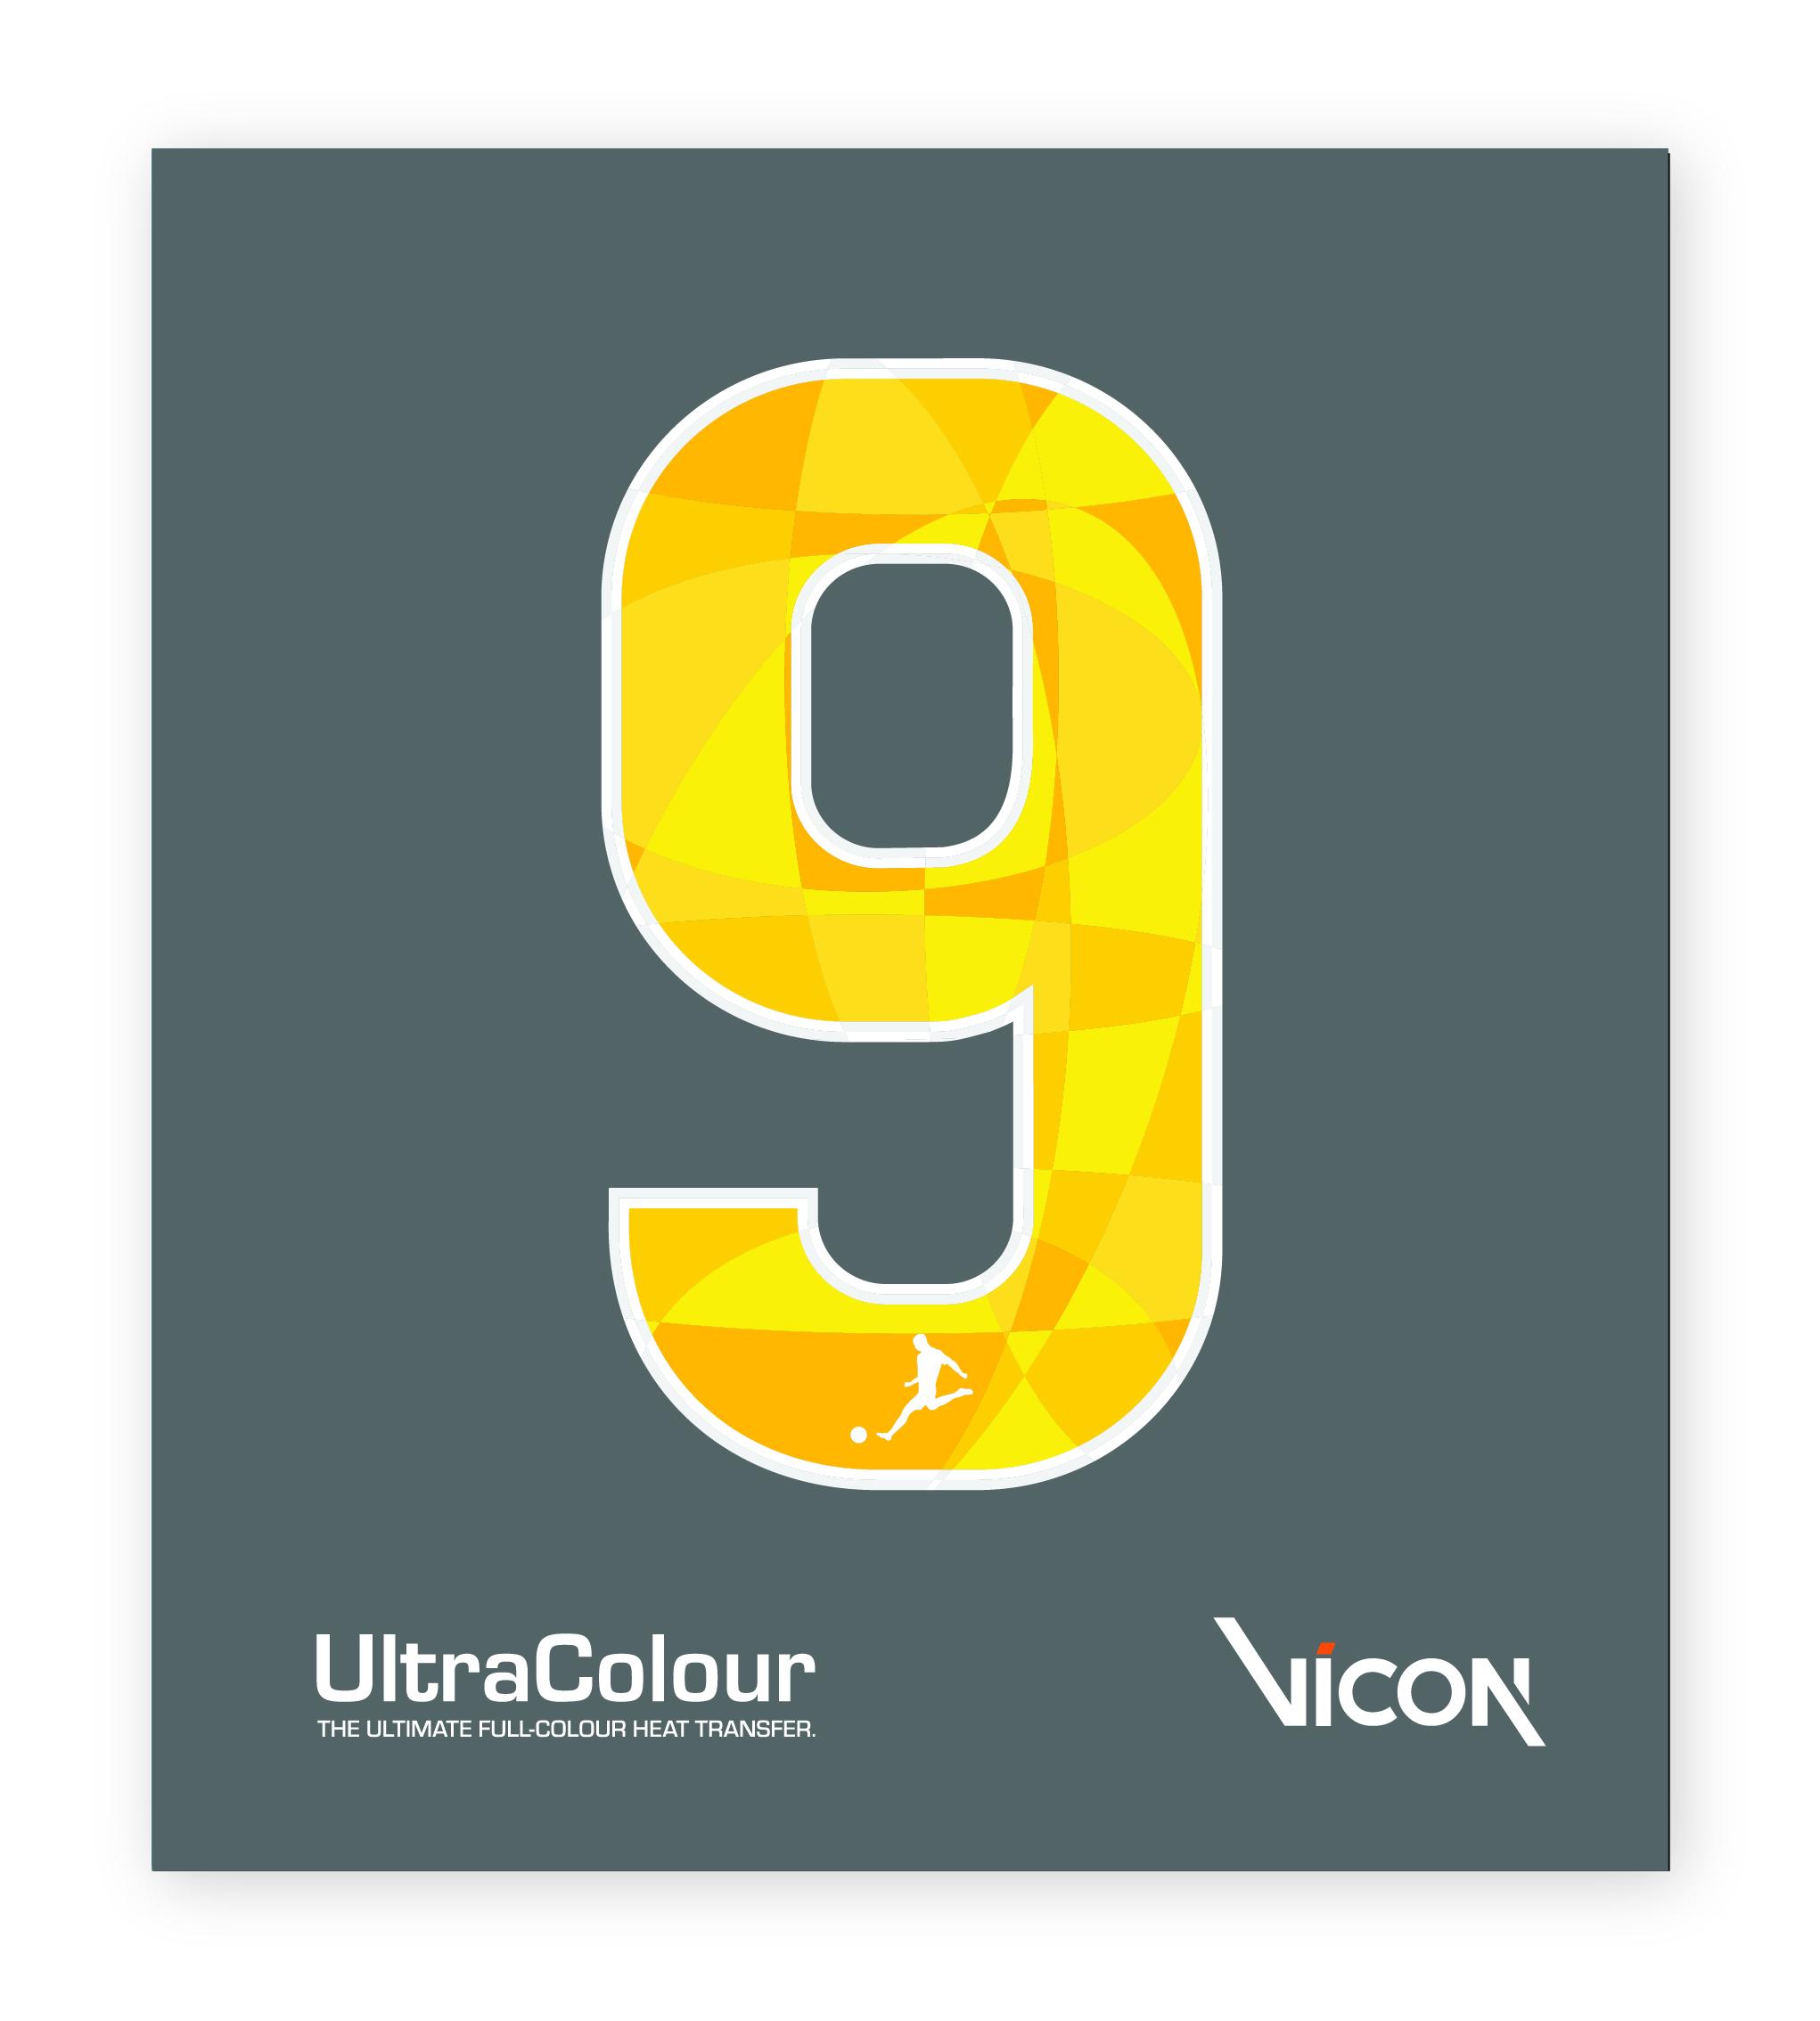 soccer-jersey-2-ultracolour@4x-100.jpg